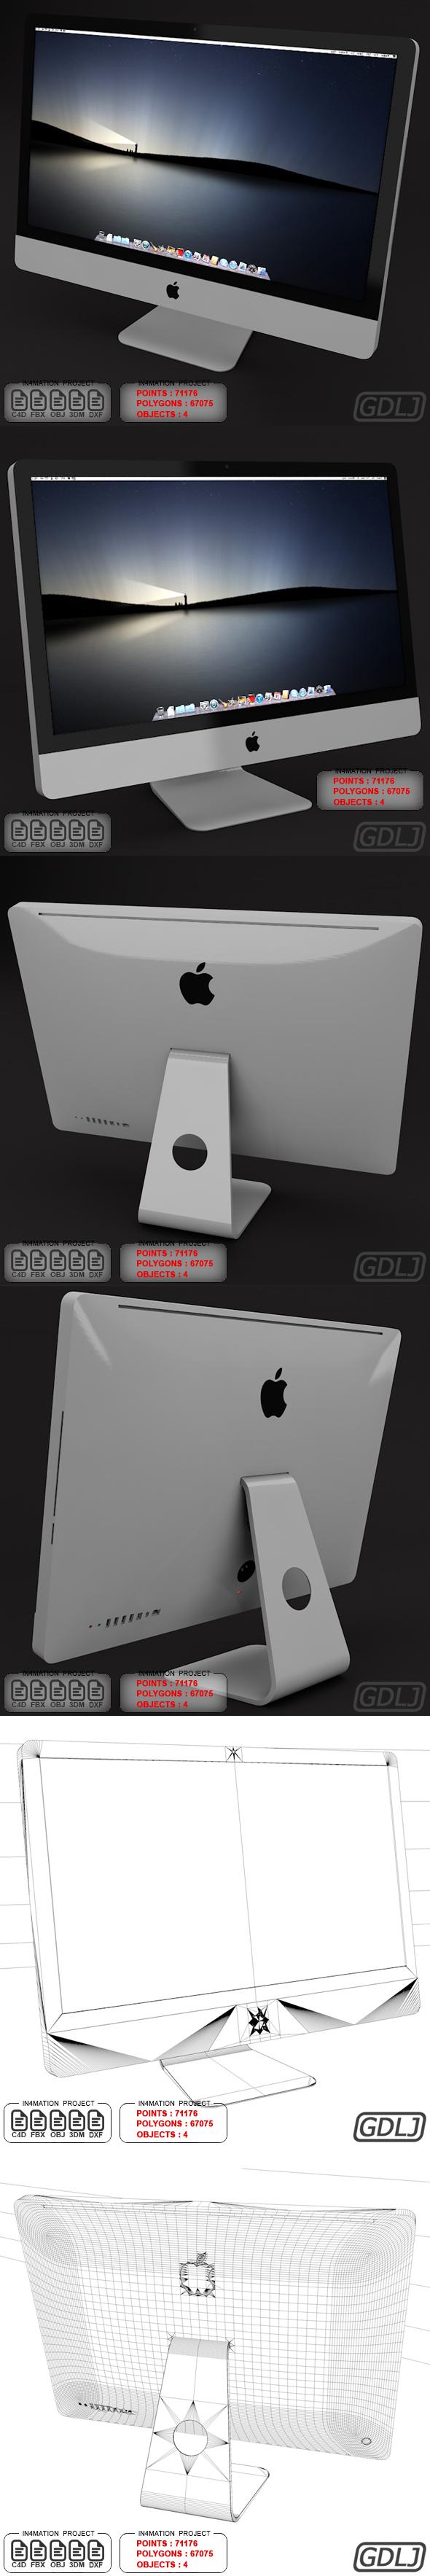 Apple iMac 27 3D Models - 3DOcean Item for Sale